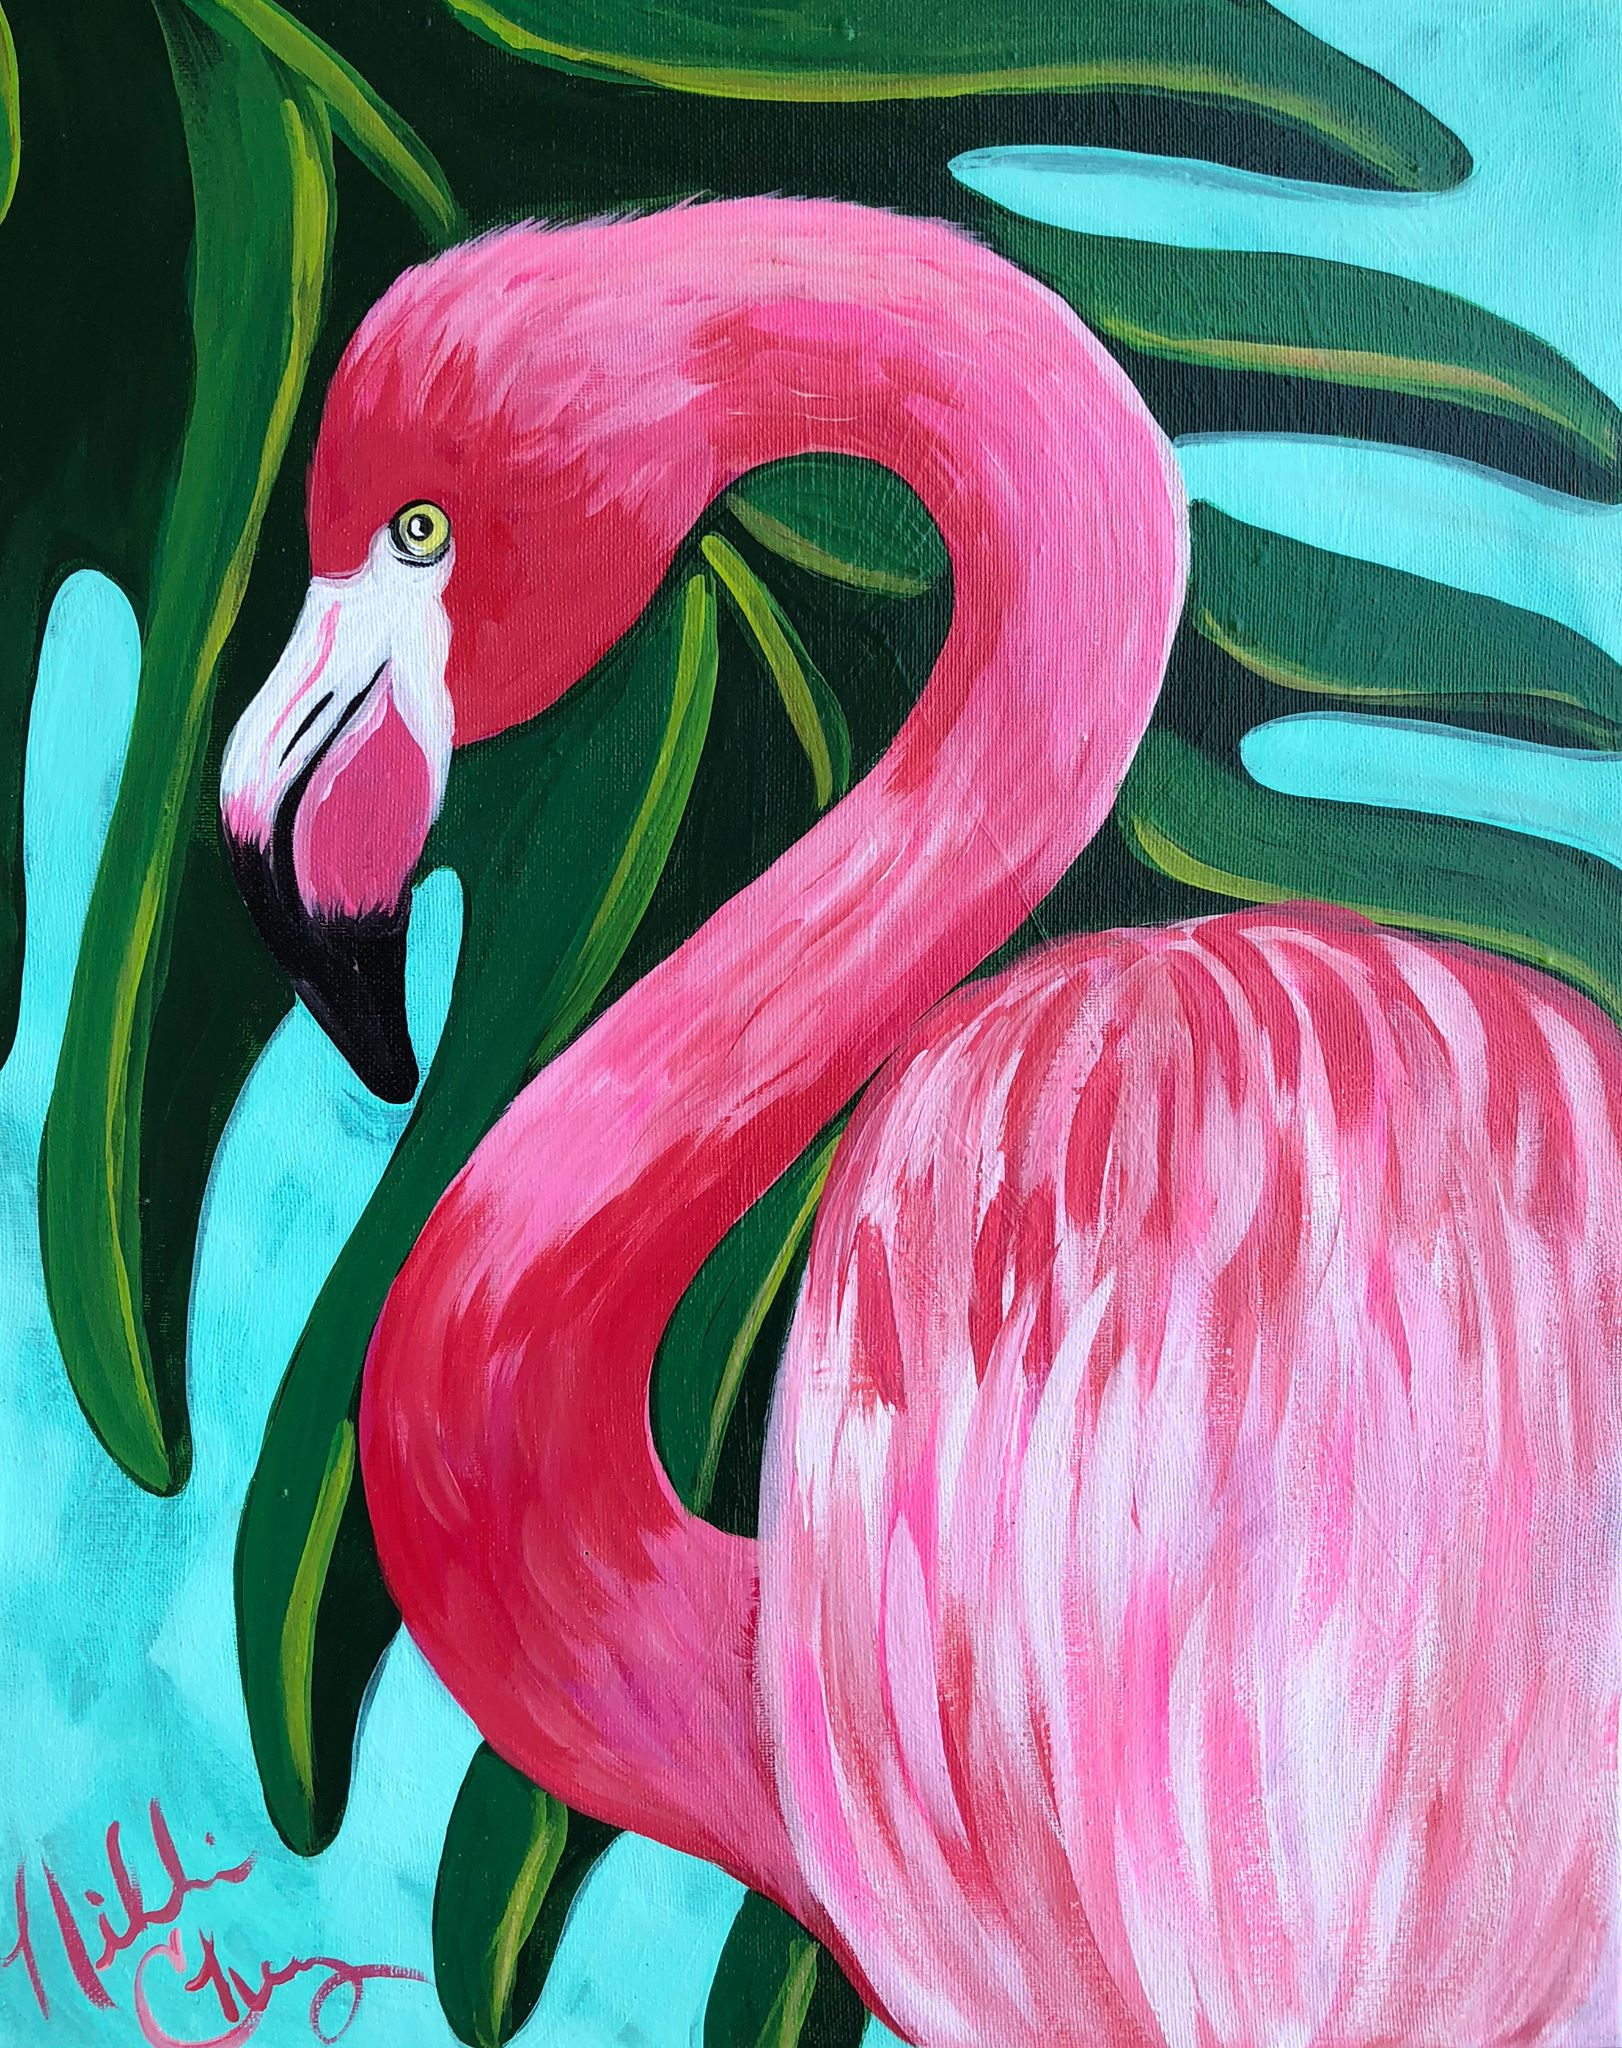 flamingo2018